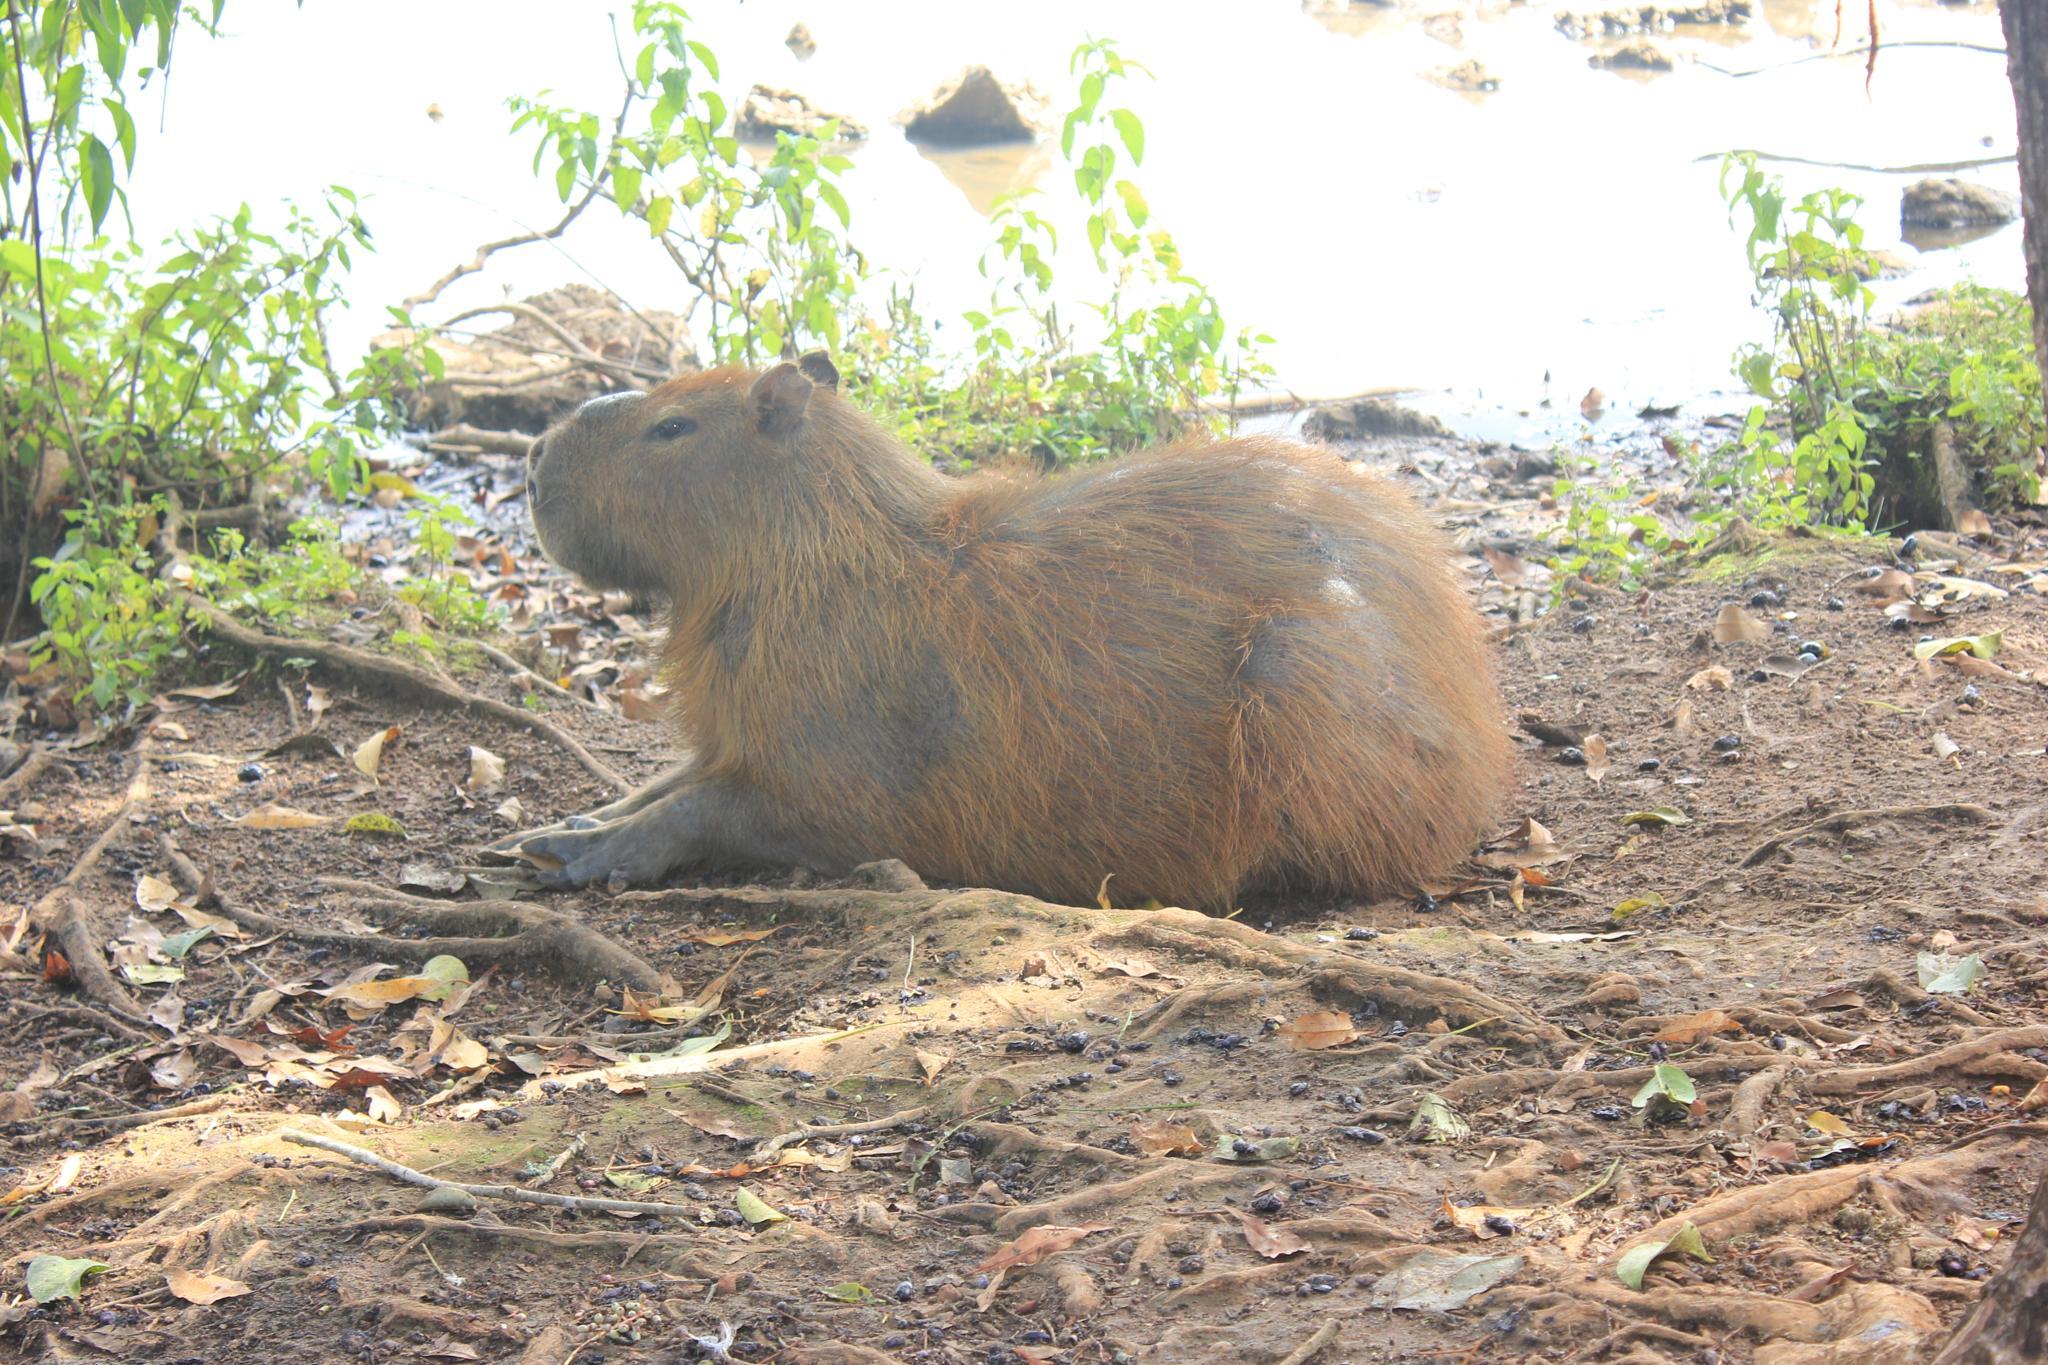 capybara by Ricardo Pacheco